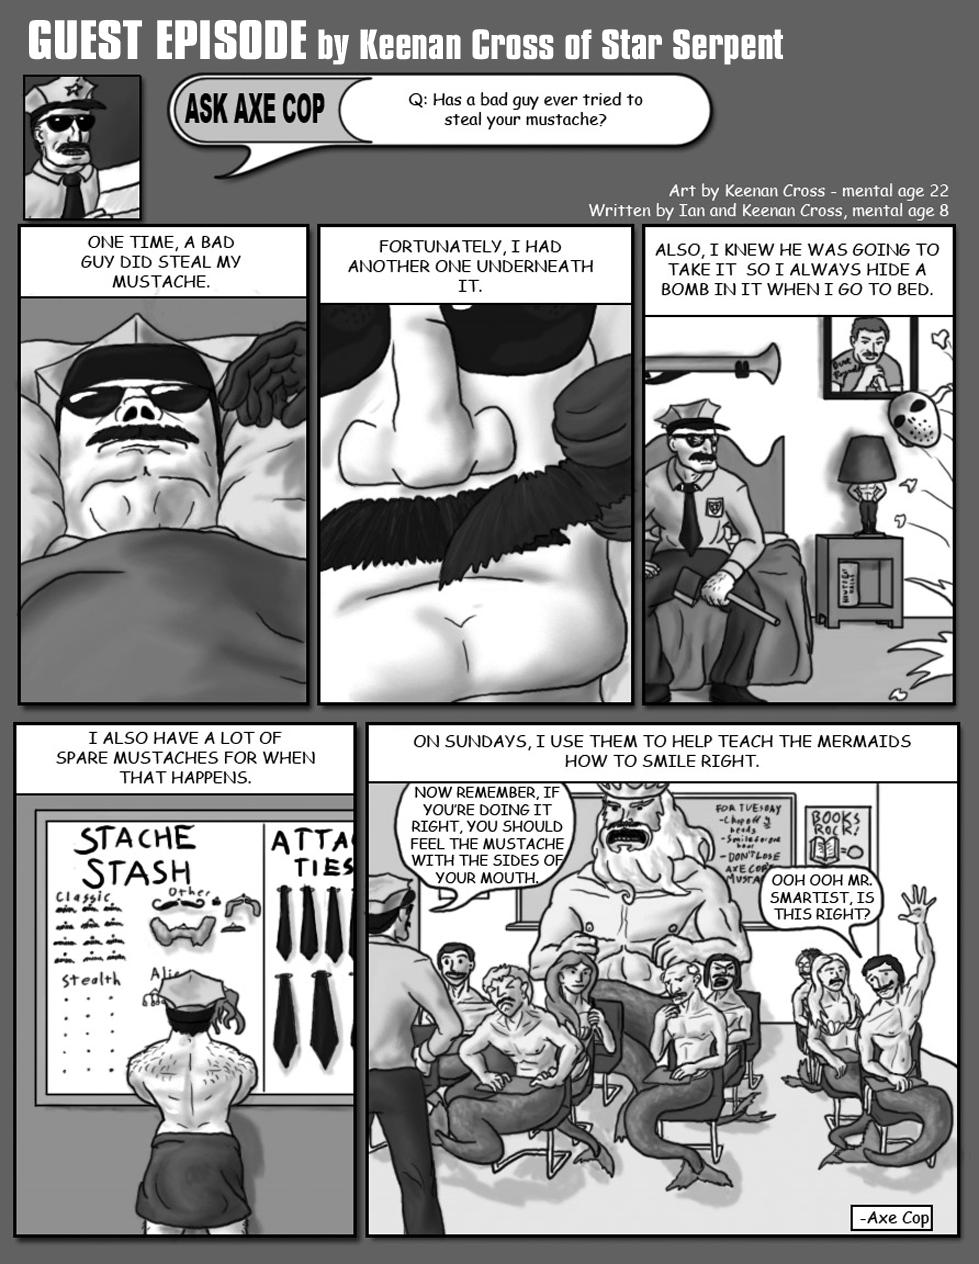 Axe Cop Guest Episode #5